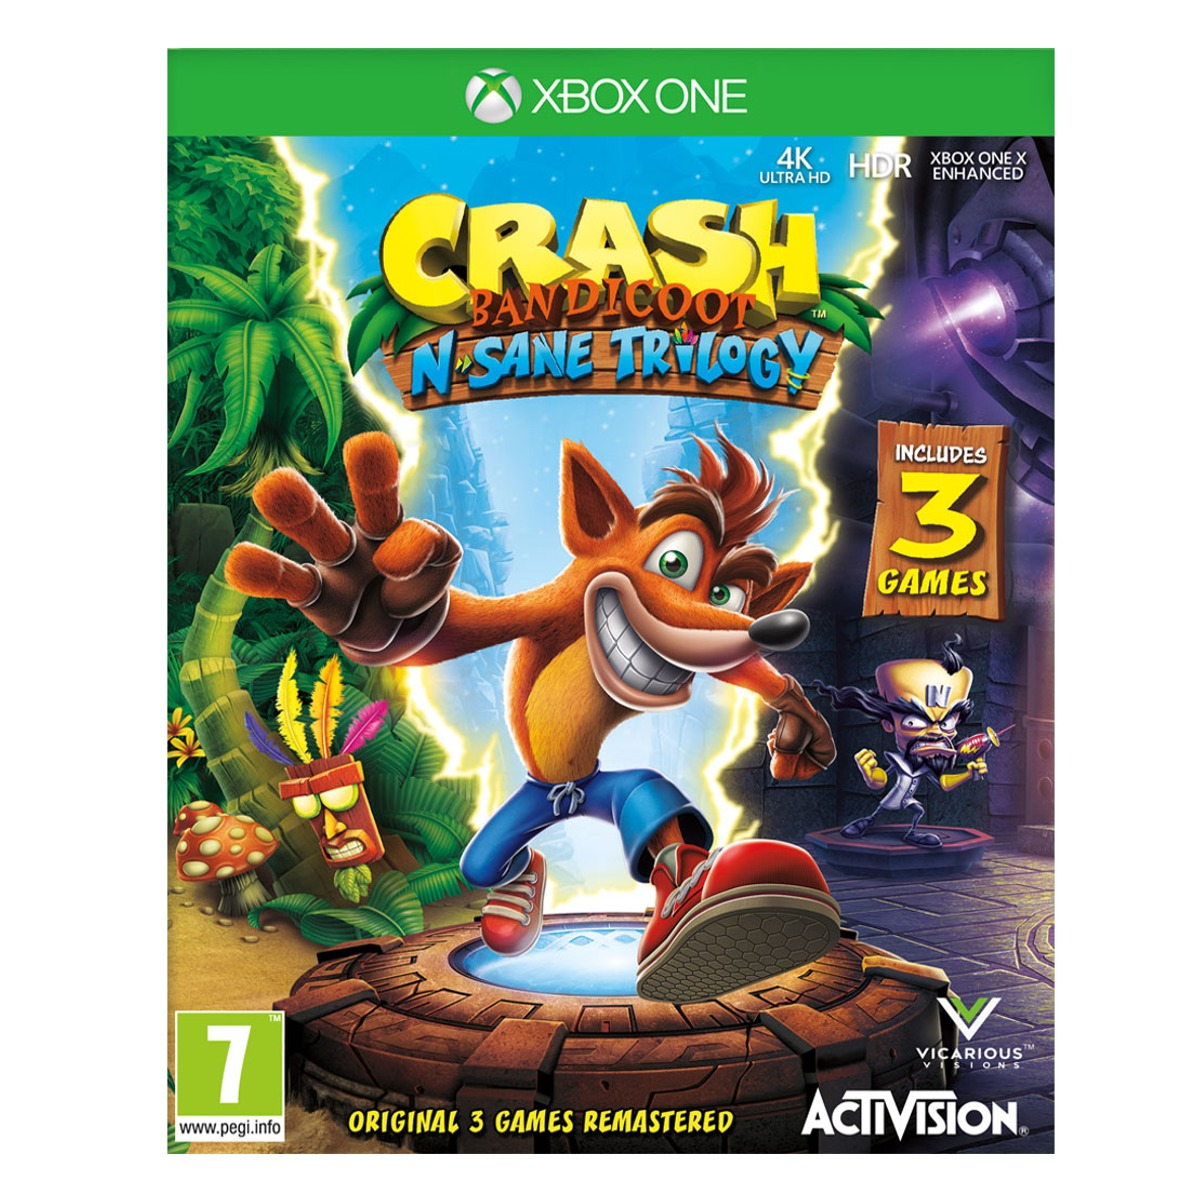 Microsoft XBOX ONE Crash Bandicoot N.Sane Trilogy